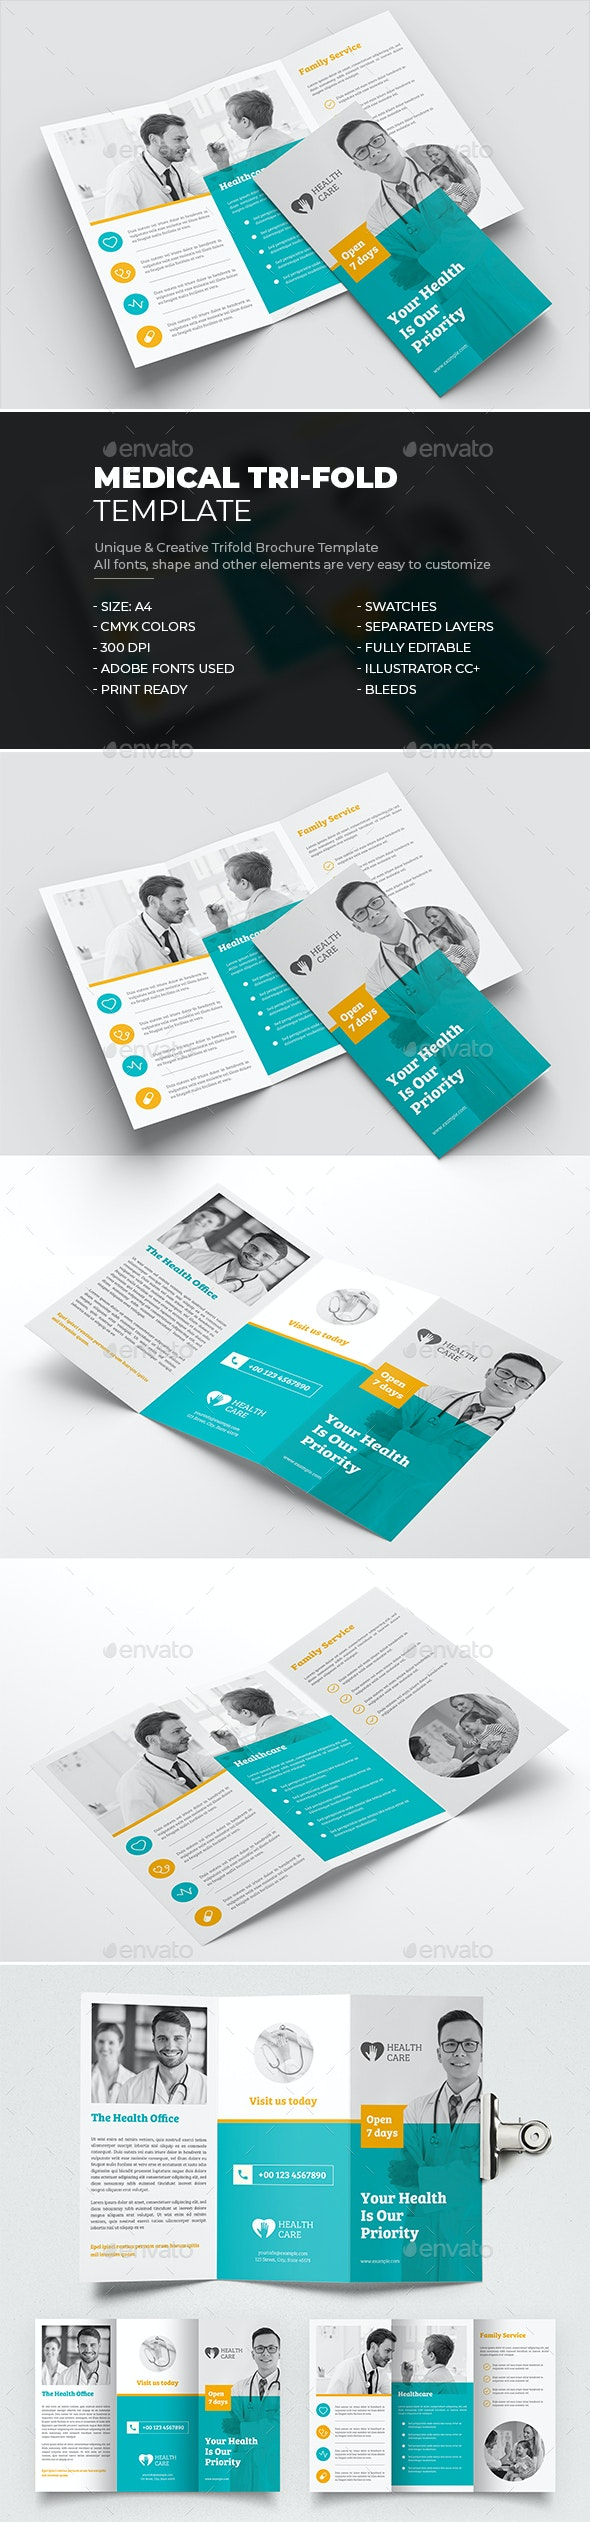 Medical Tri-Fold Brochure - Corporate Brochures